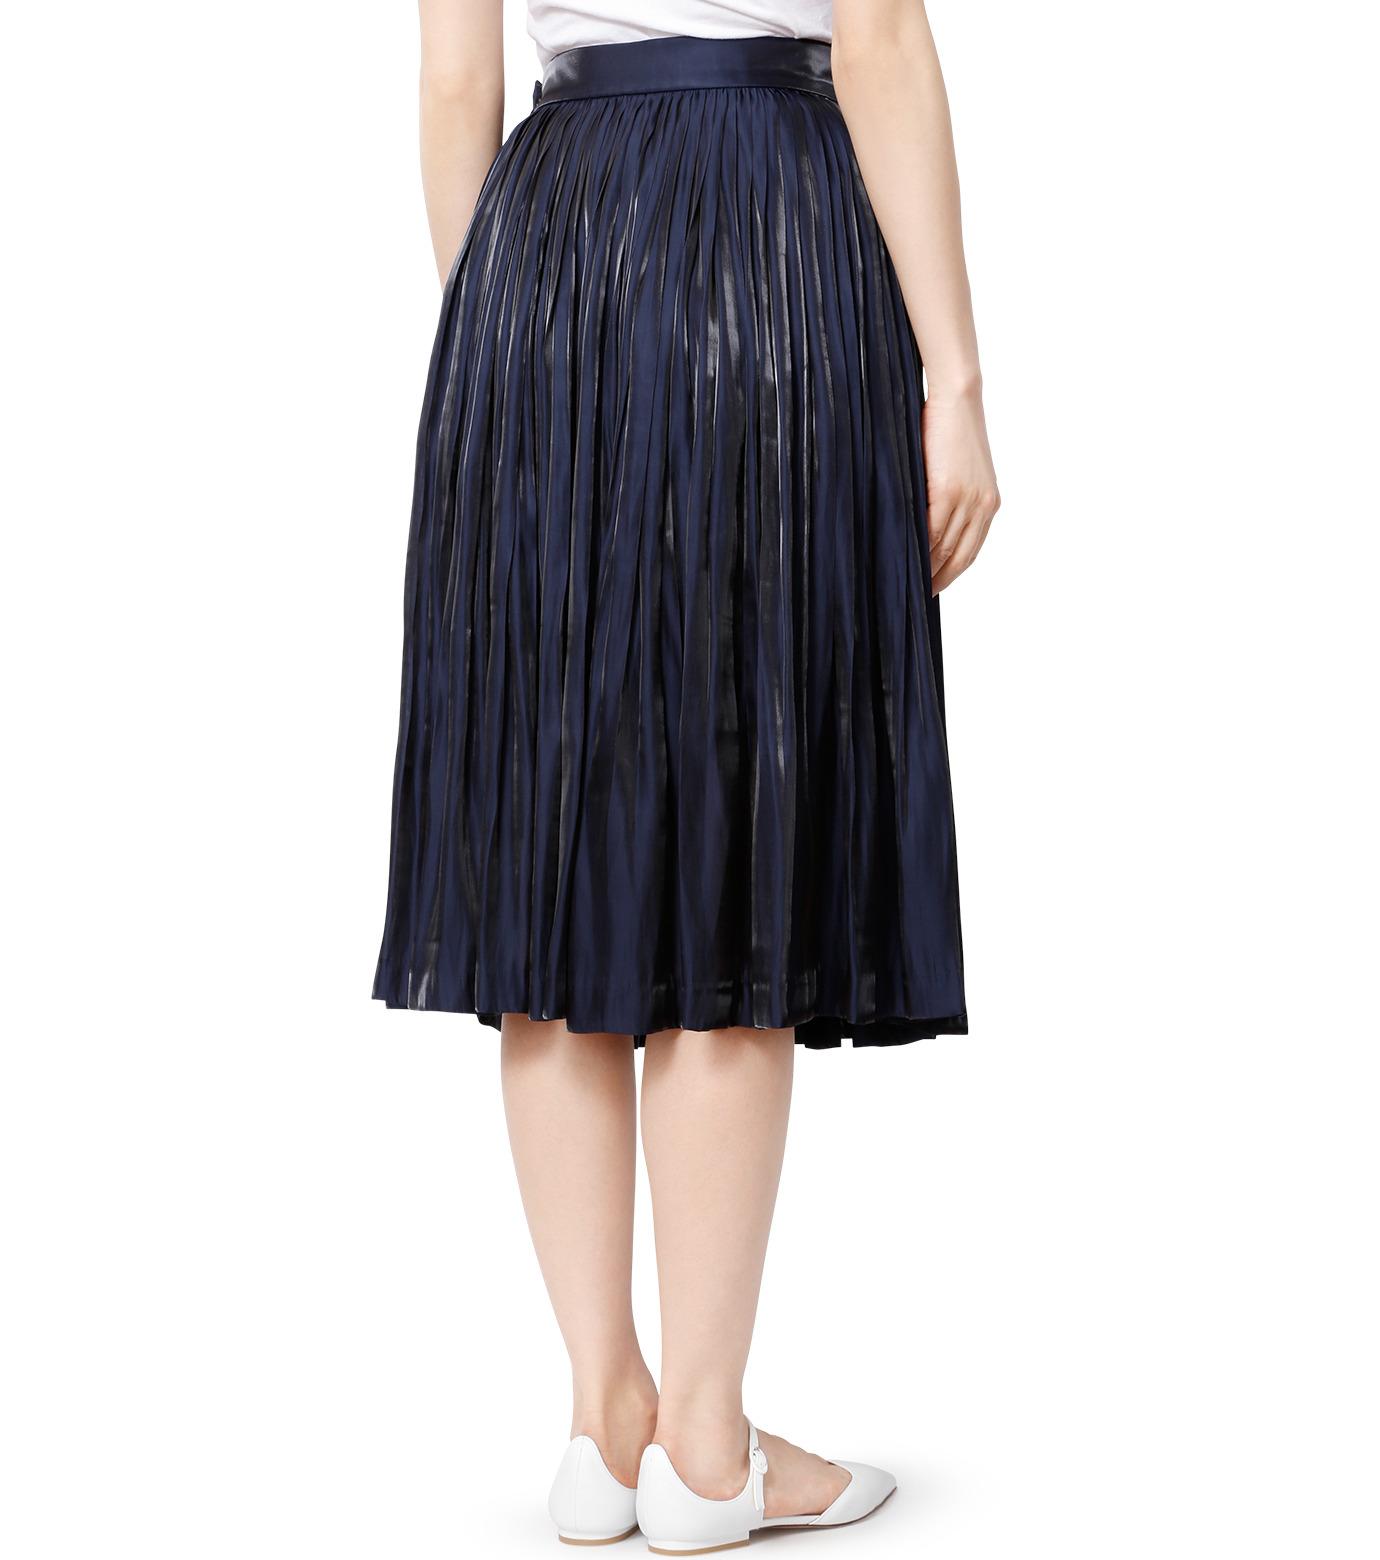 LE CIEL BLEU(ルシェルブルー)のプリーツスカート-NAVY(スカート/skirt)-18A67206 拡大詳細画像2